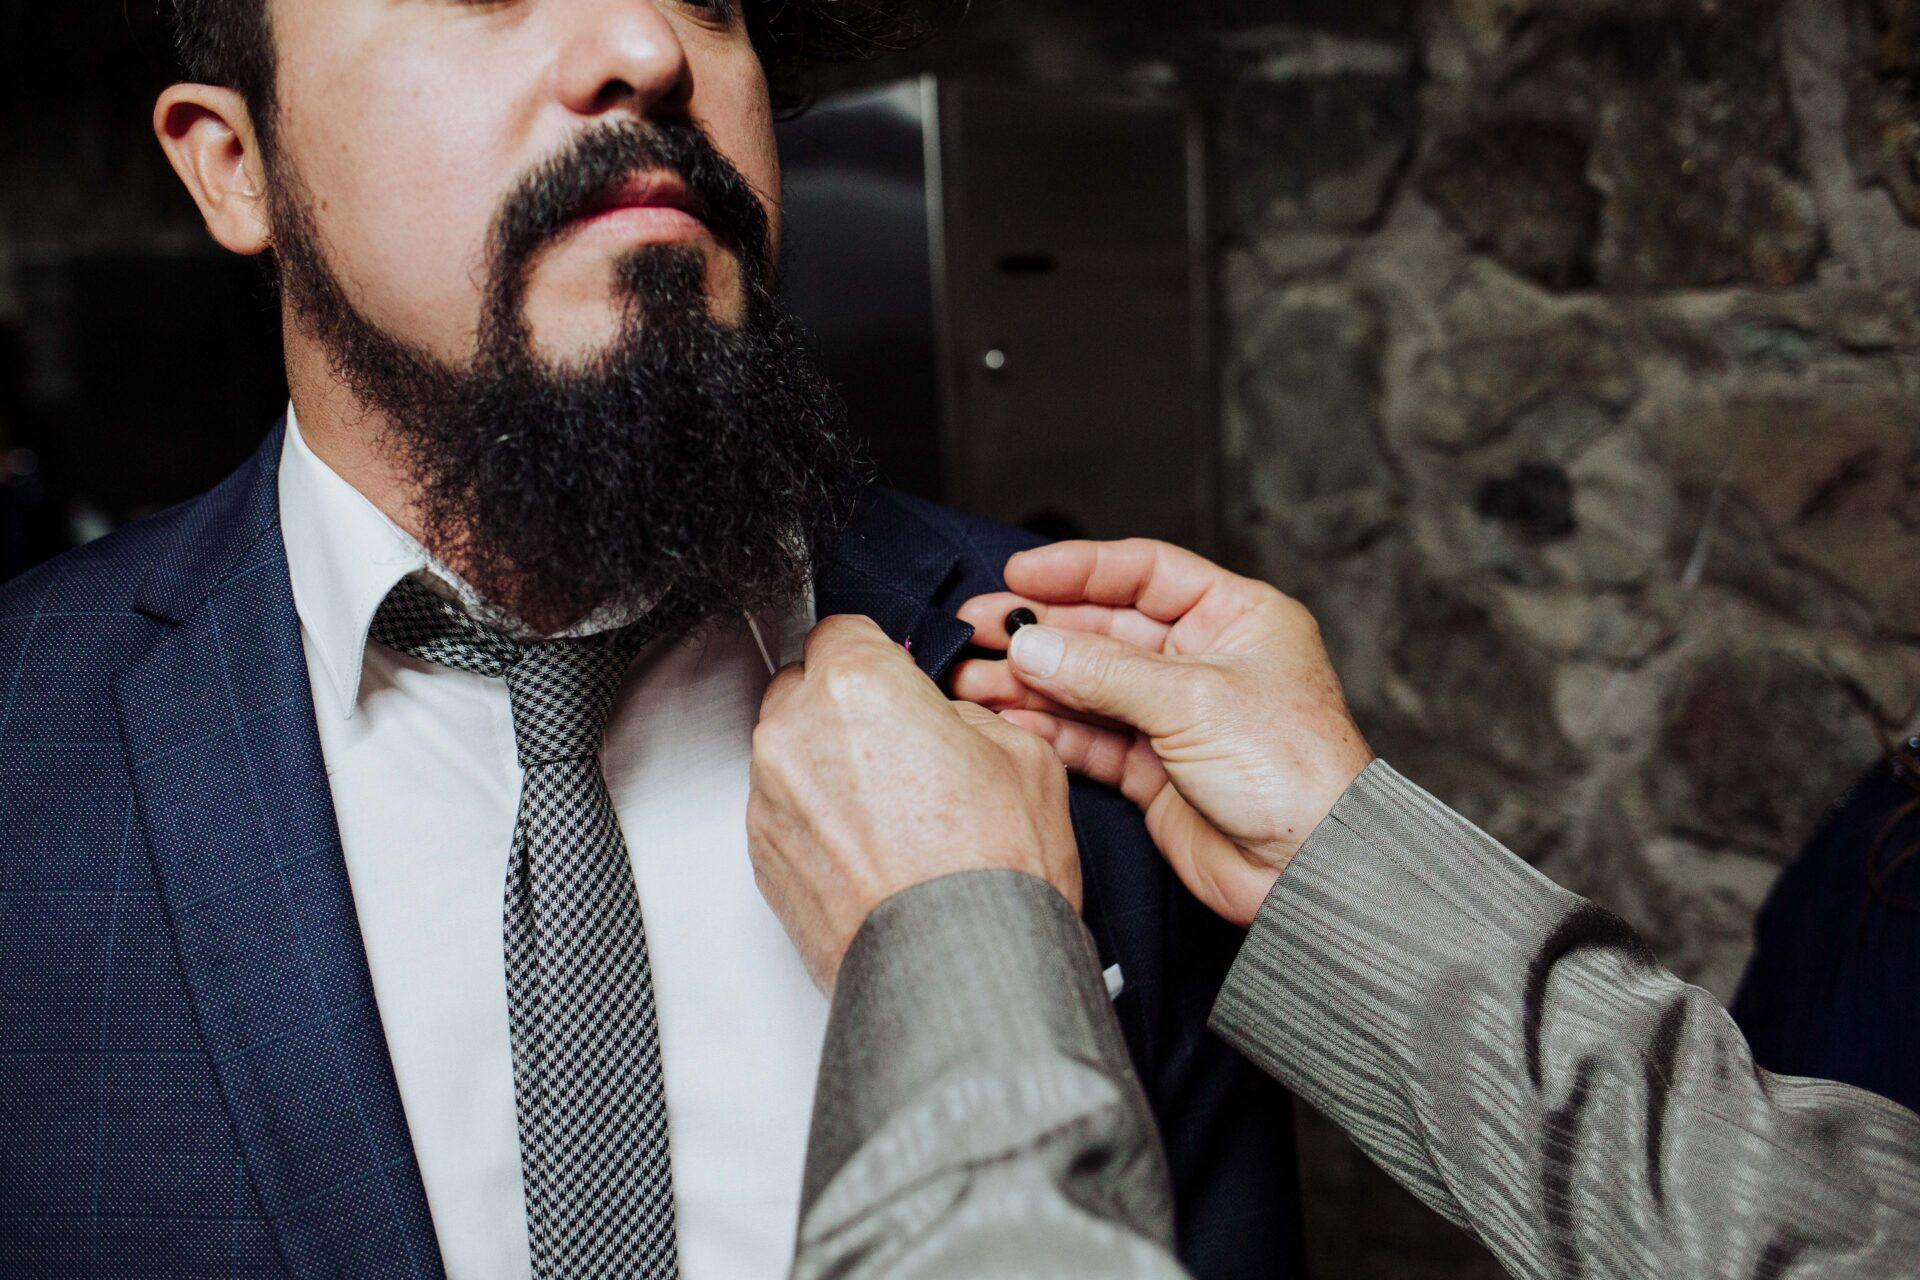 javier_noriega_fotografo_bodas_la_mina_club_zacatecas_wedding_photographer4